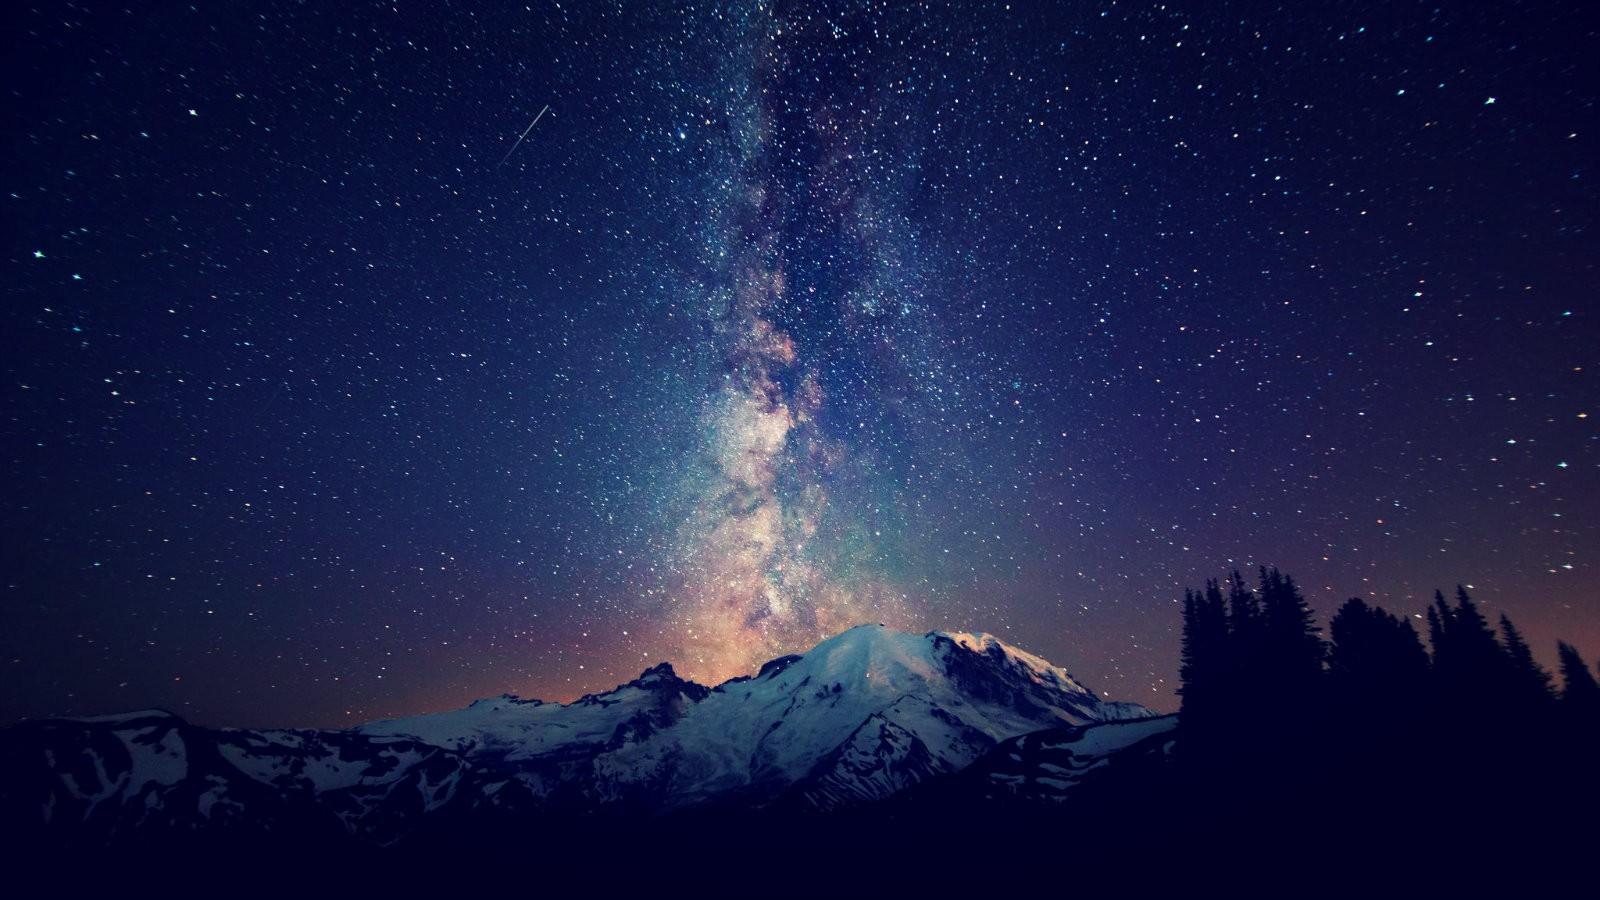 Mountain blue mountain nature night star 1600x900